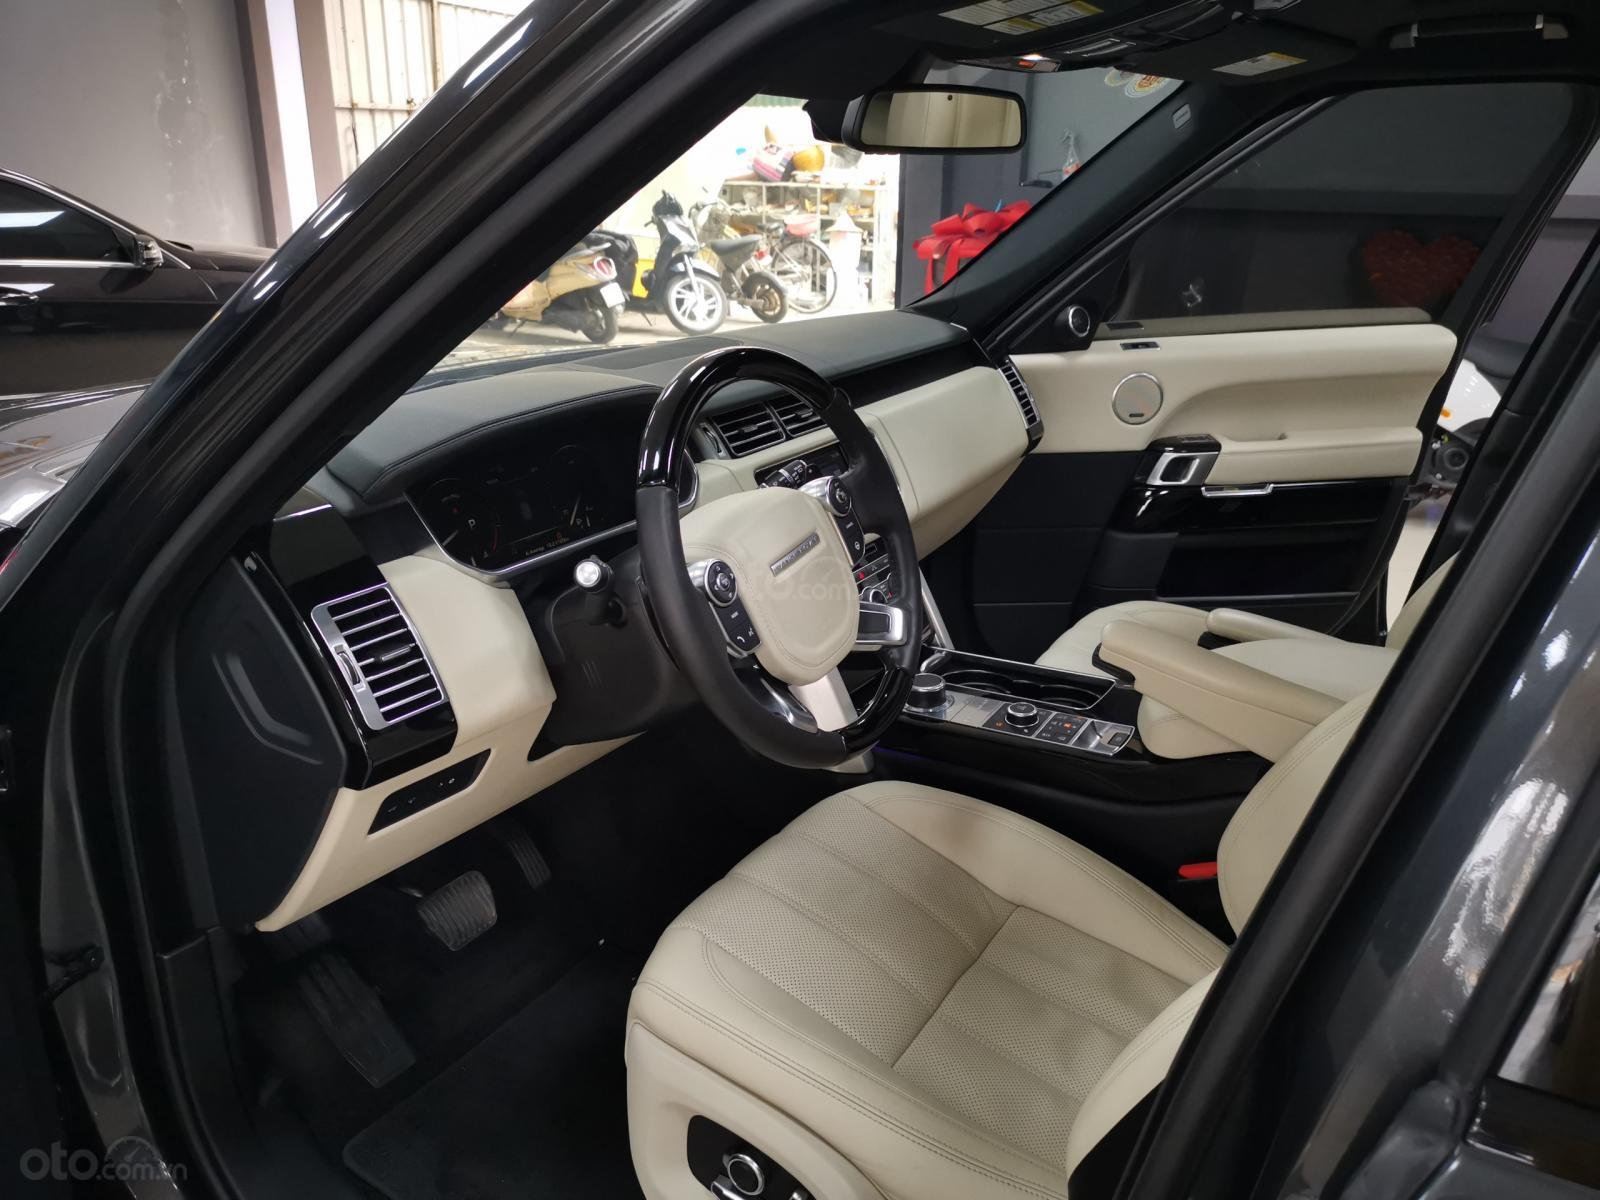 Bán nhanh chiếc xe Ranger Rover HSE 2016 (13)